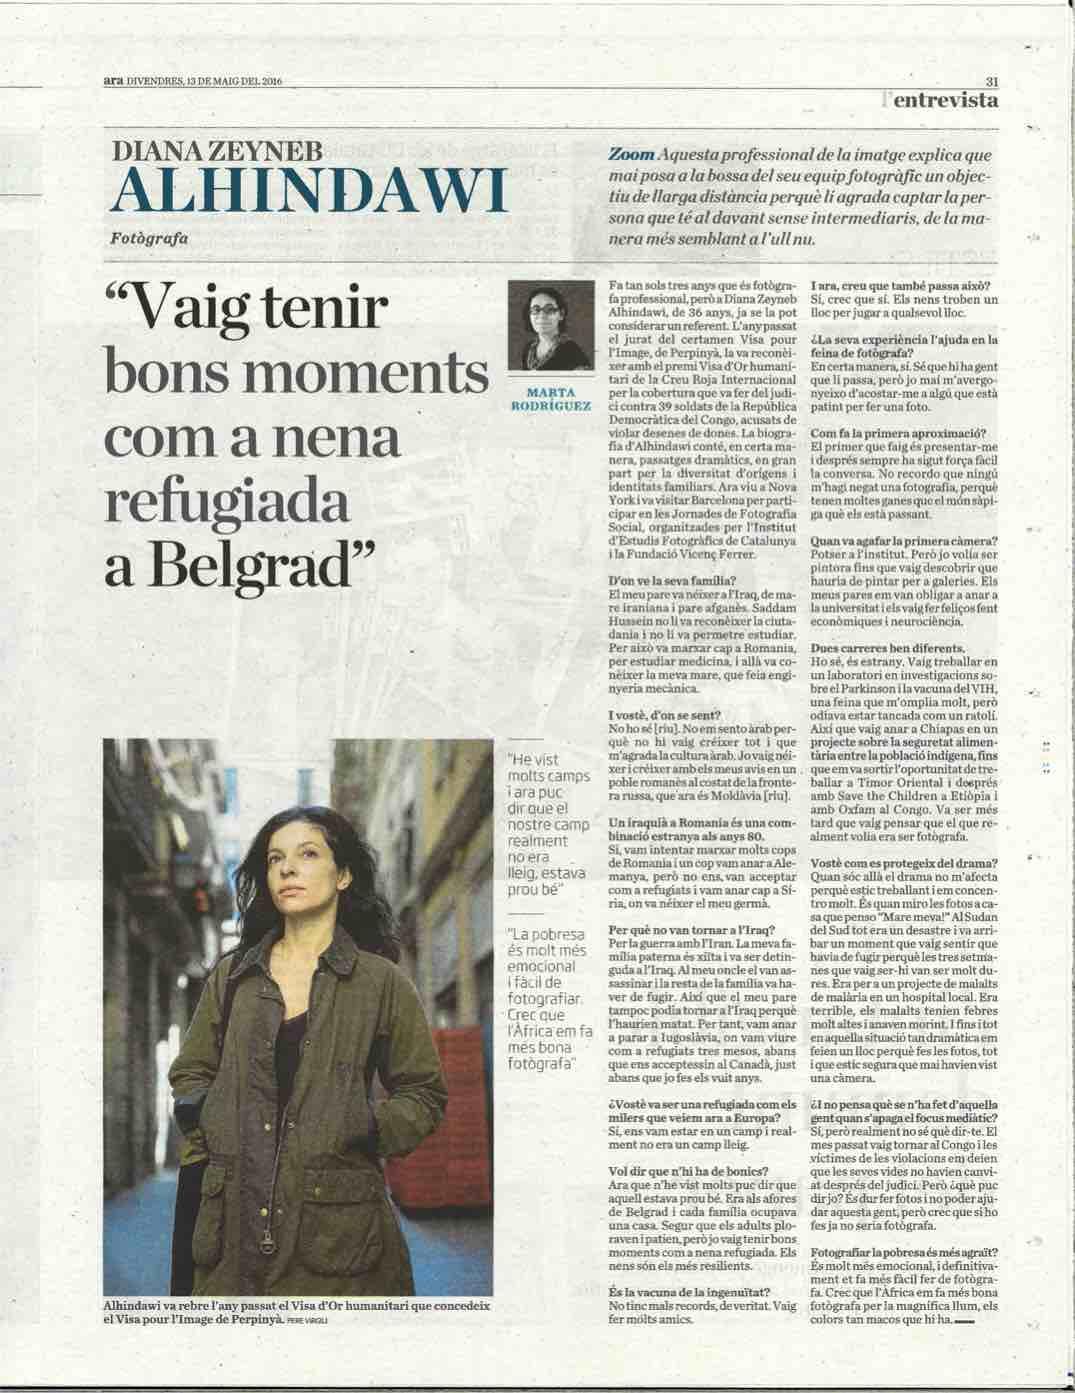 "Diana Zeyneb Alhindawi, Fotografa: ""Vaig tenir bons moments com a nena refugiada a Belgrad"" | Diari ARA (print), May 13, 2016"